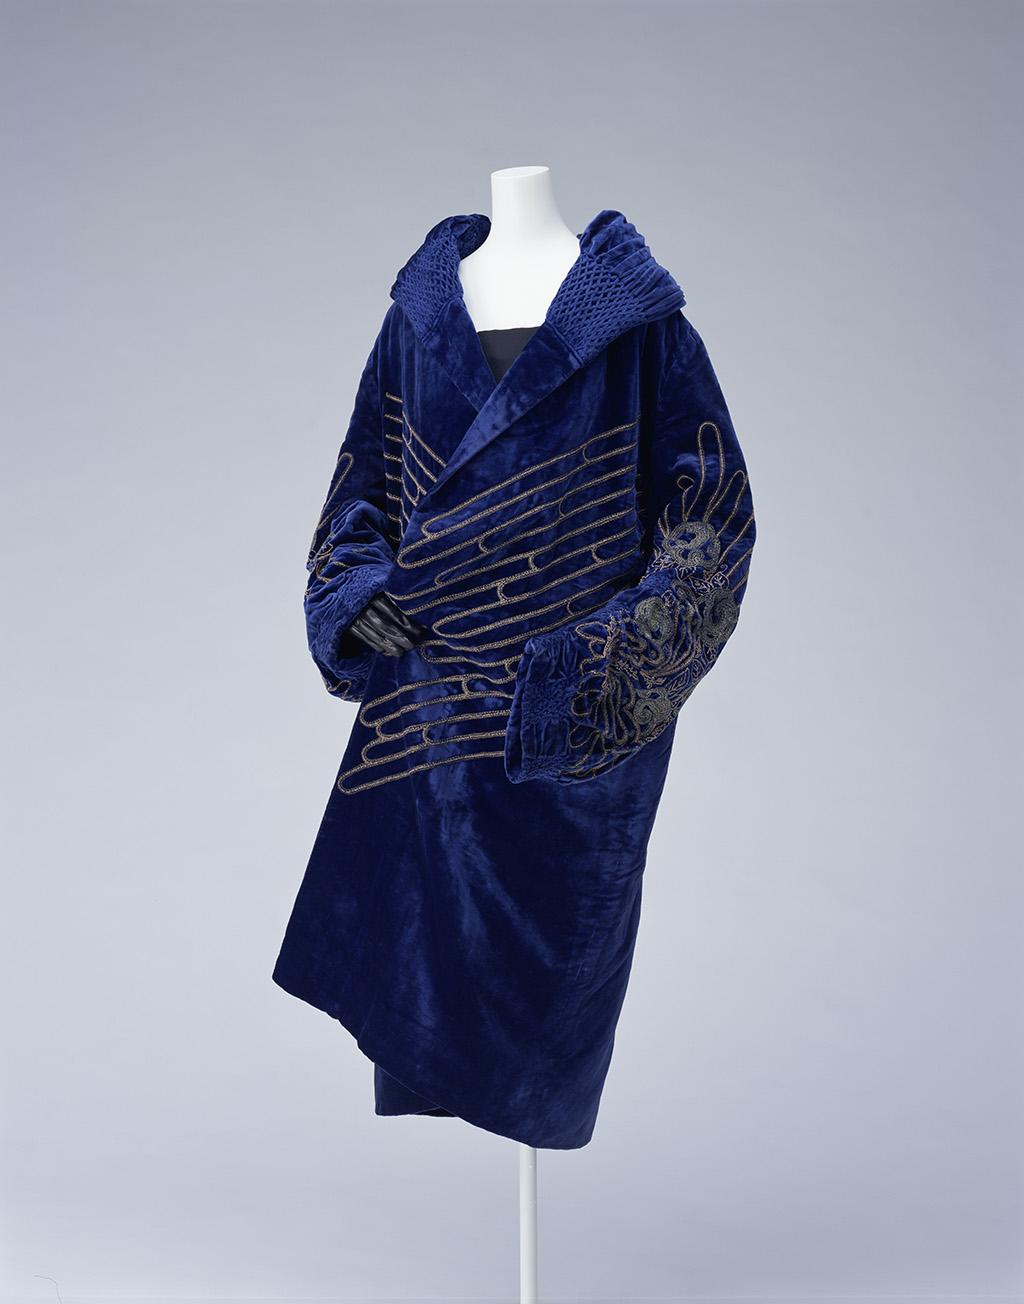 Пальто Поль Пуаре Франция, около 1925 Коллекция Института костюма Киото Фото © Такаси Хатакэяма